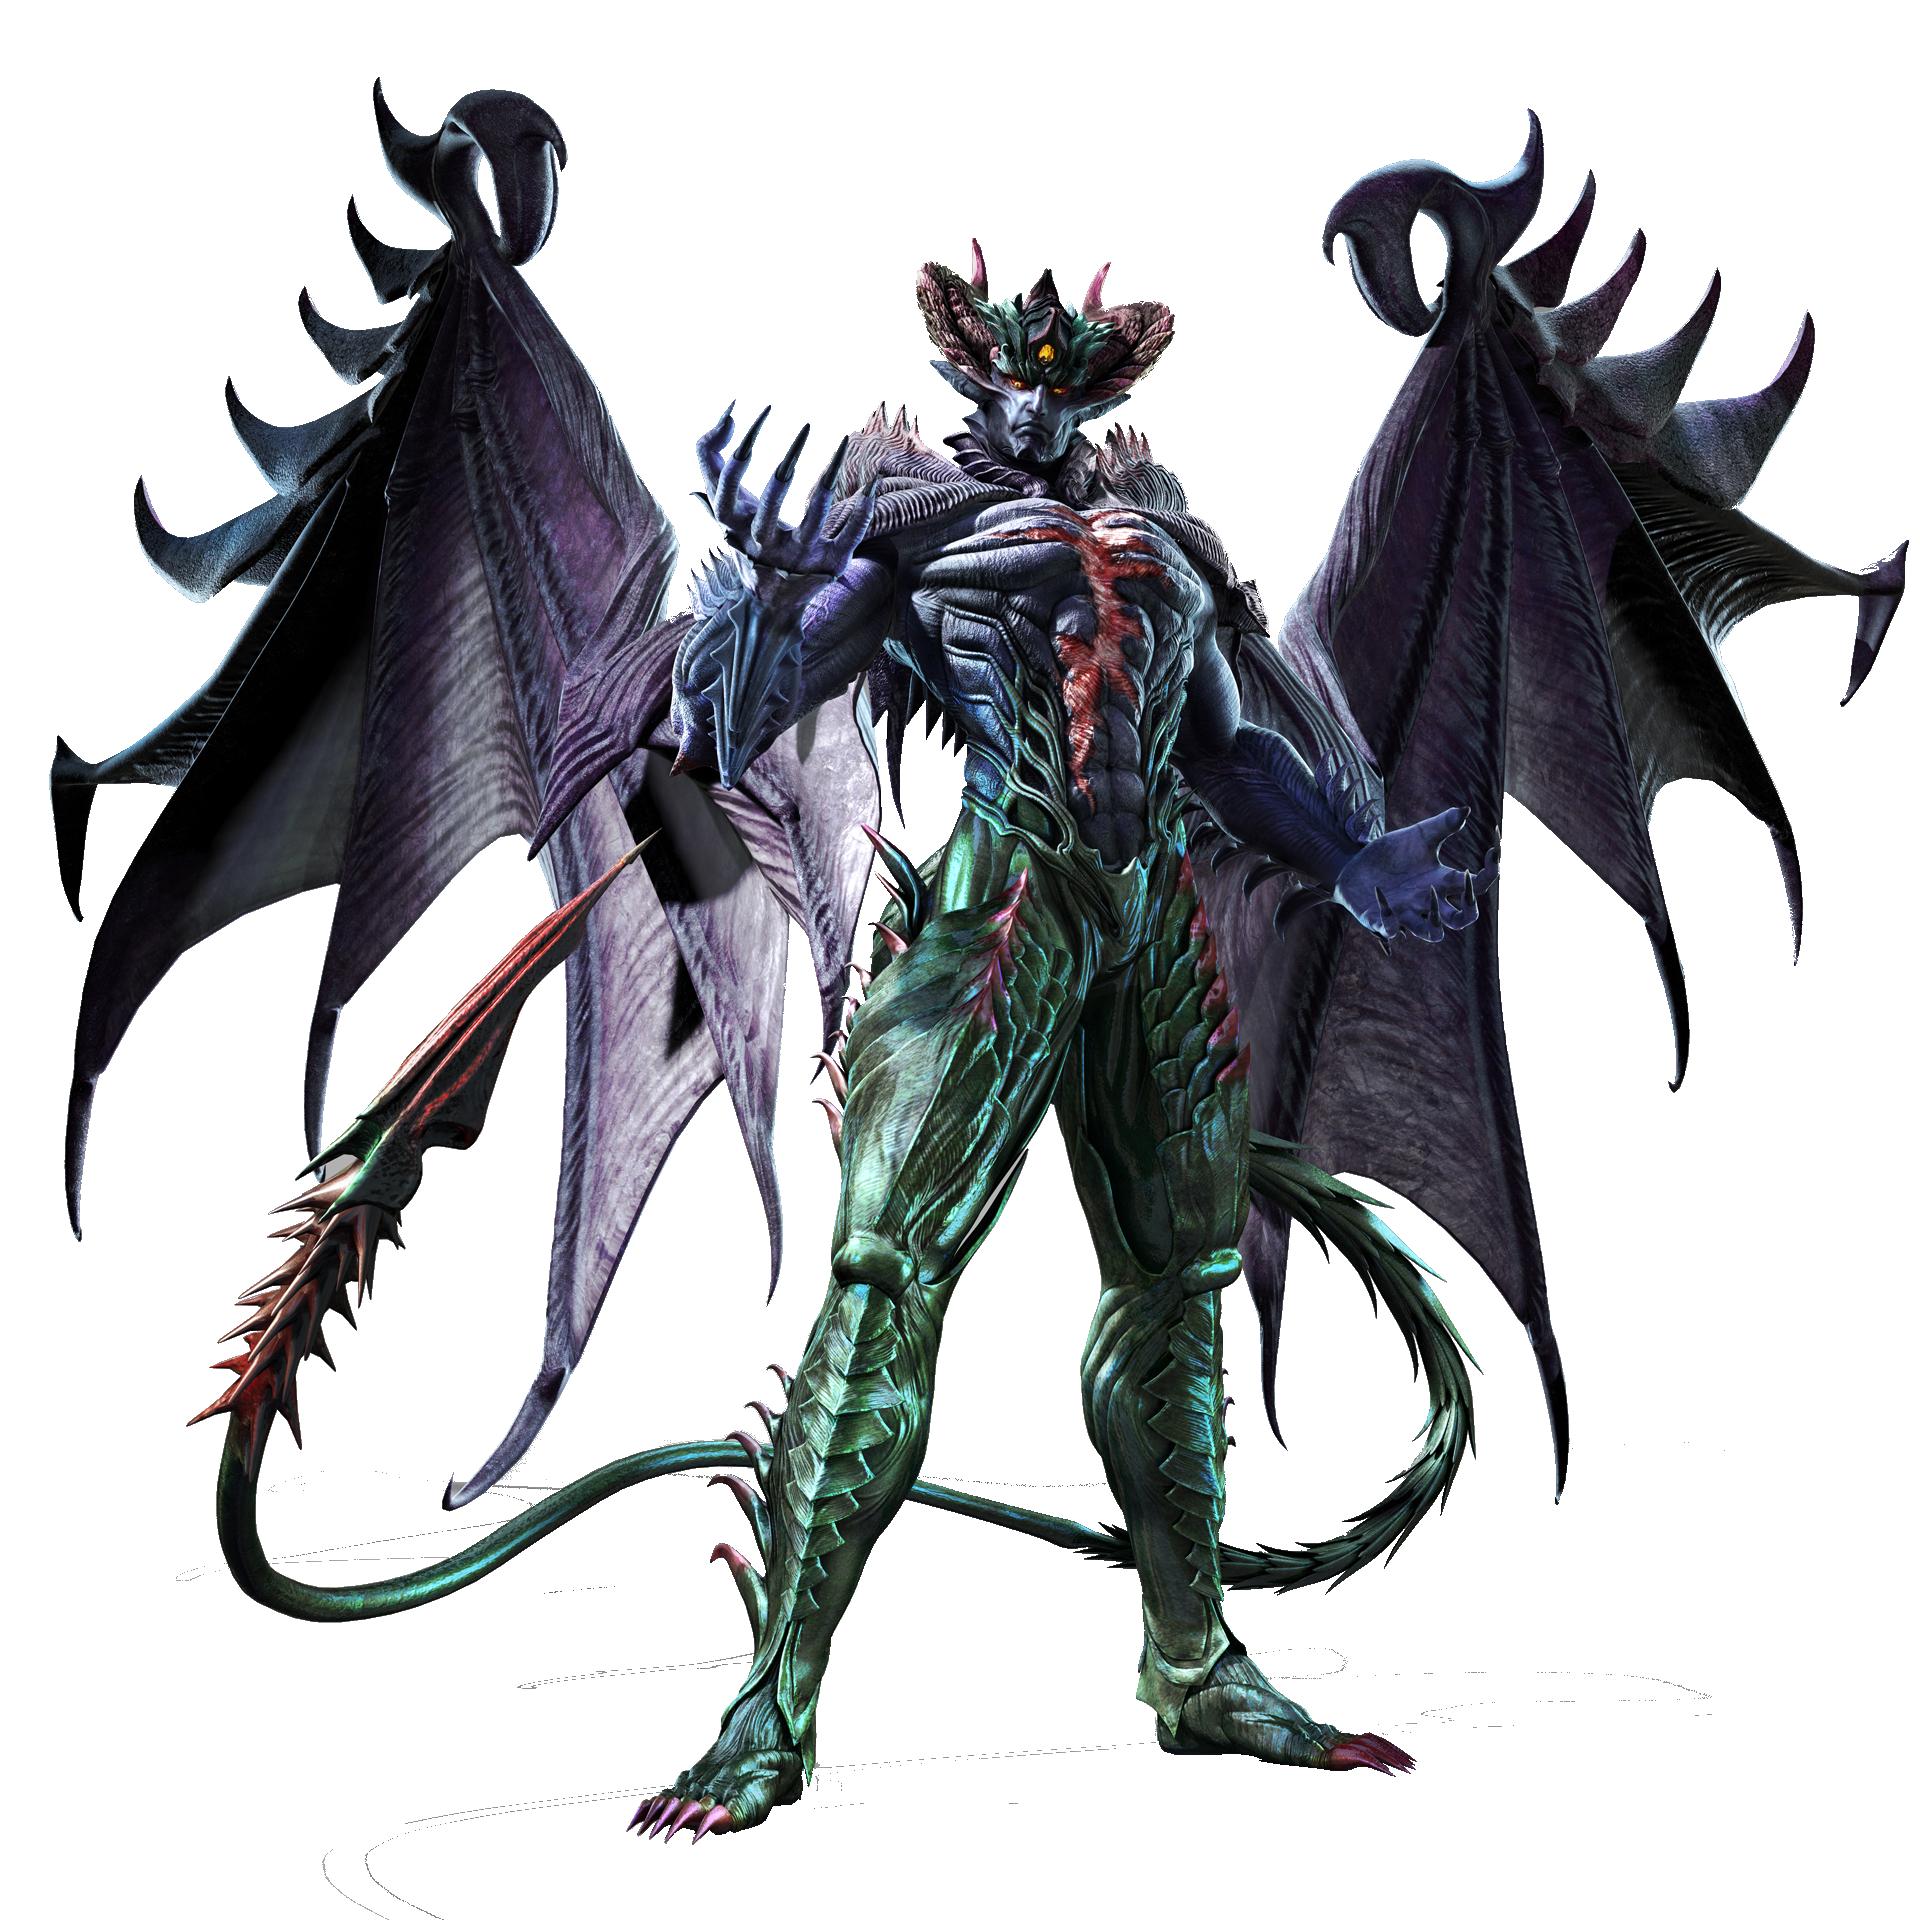 Devil Kazuya [True Form] Beta Extraction by jin-05 on DeviantArt